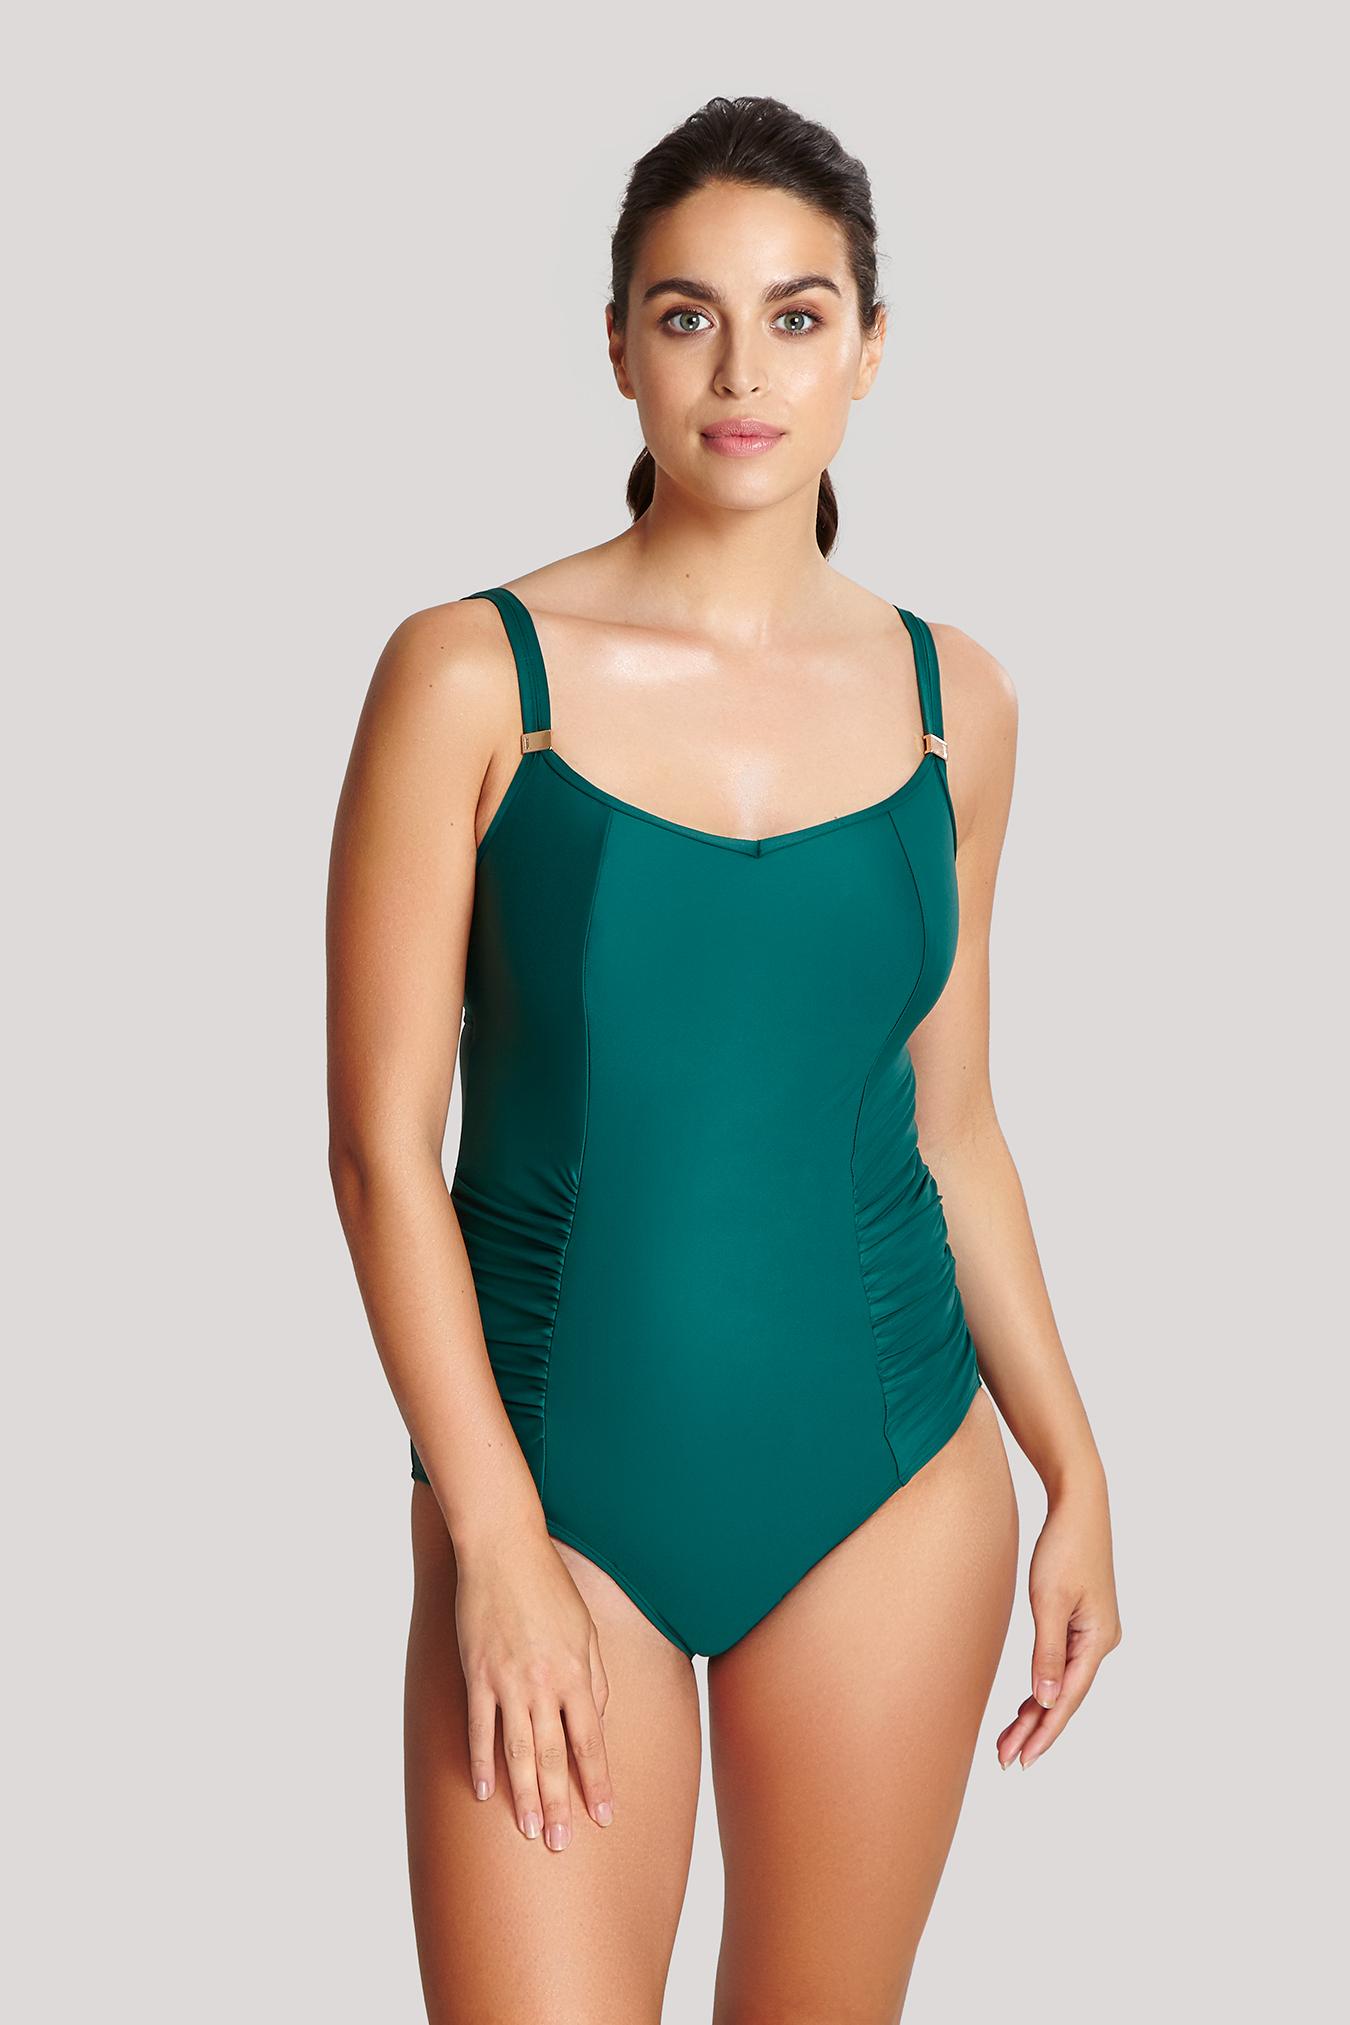 Panache BLACK Anya Bra-Sized Balconnet One-Piece Swimsuit US 38GG